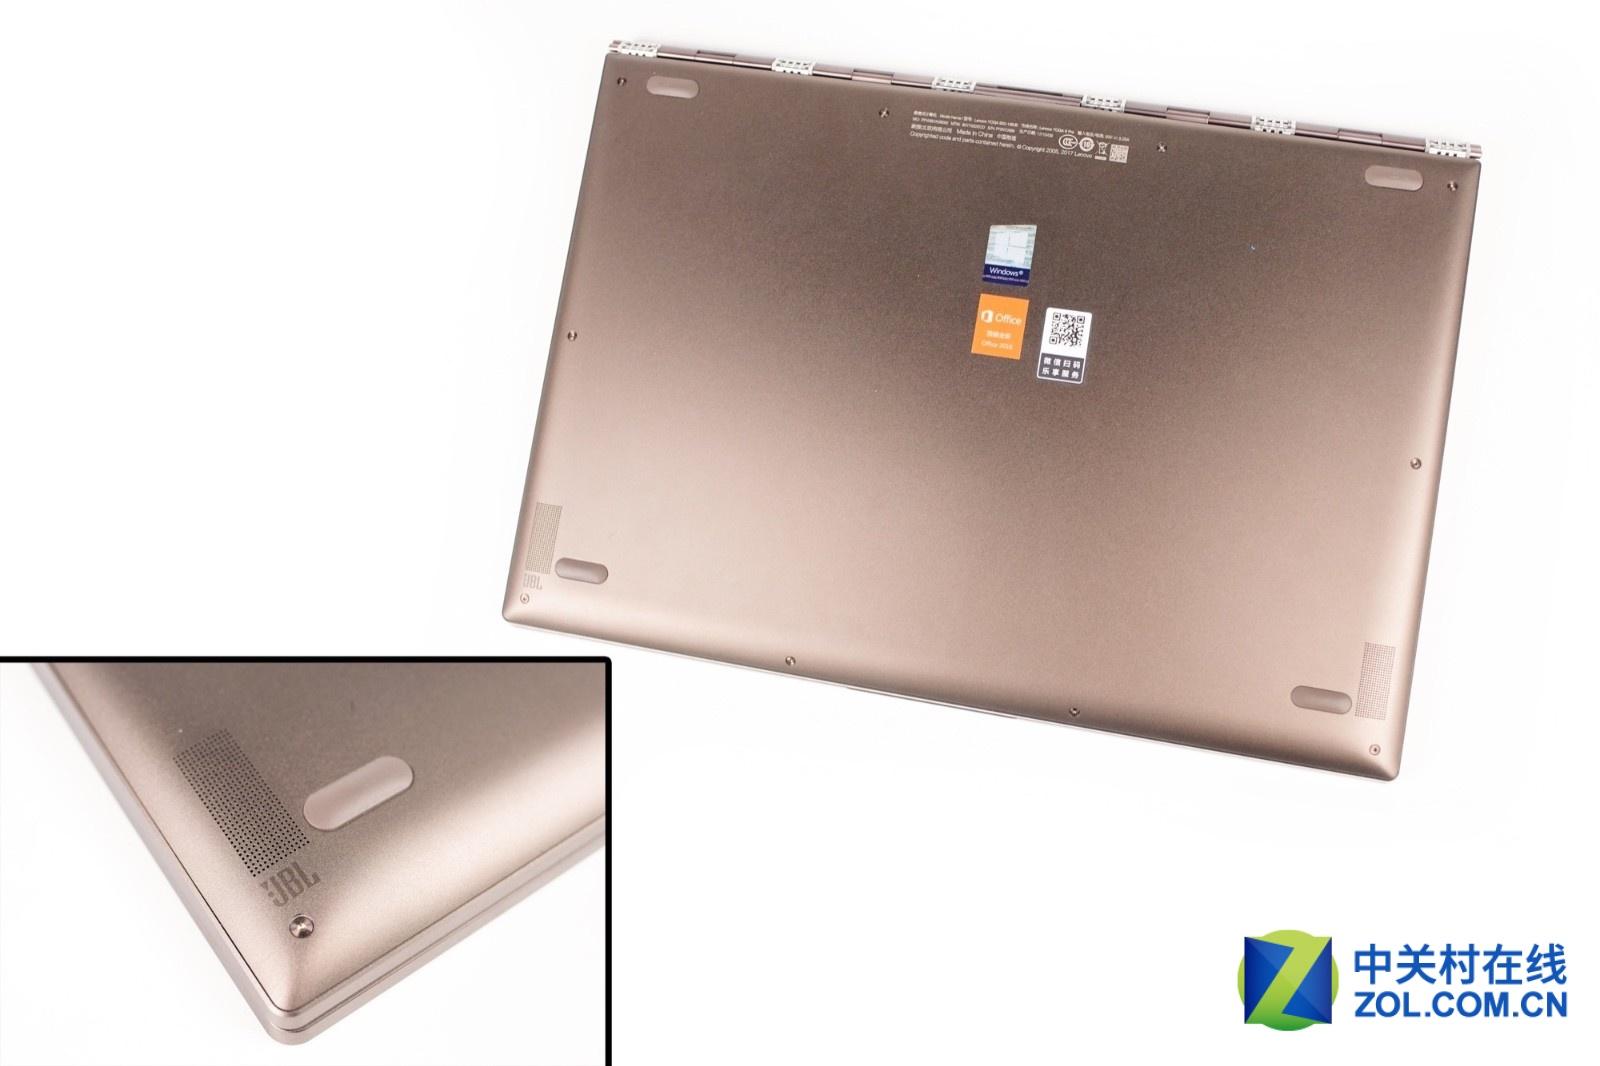 Lenovo Yoga 920 Disassembly (SSD, RAM Upgrade Options) - Laptopmain com